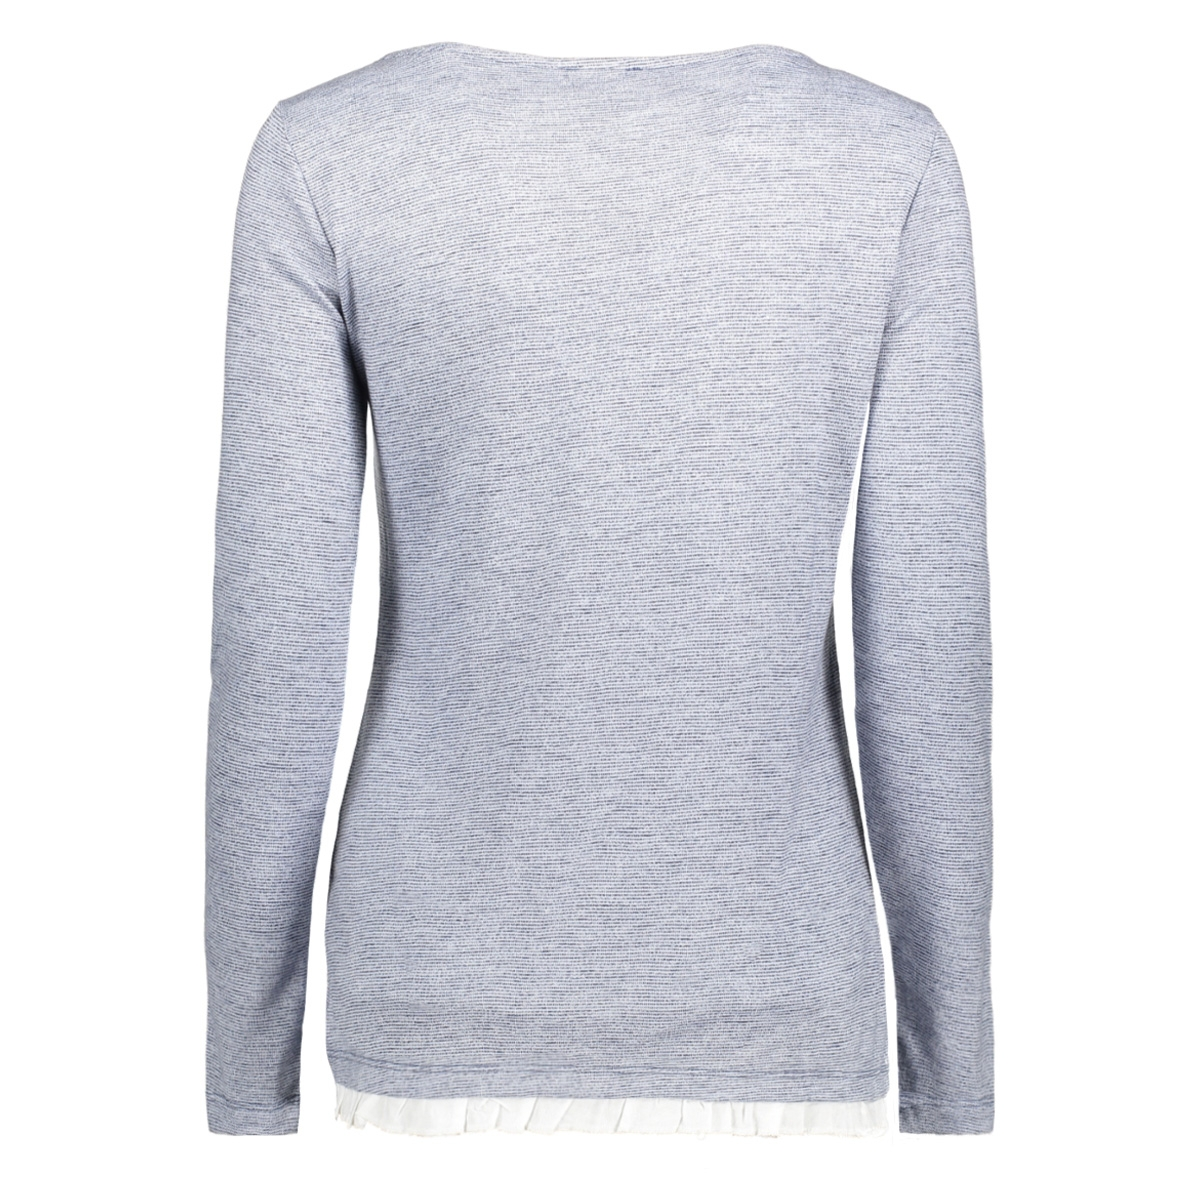 1039006.00.70 tom tailor t-shirt 6783